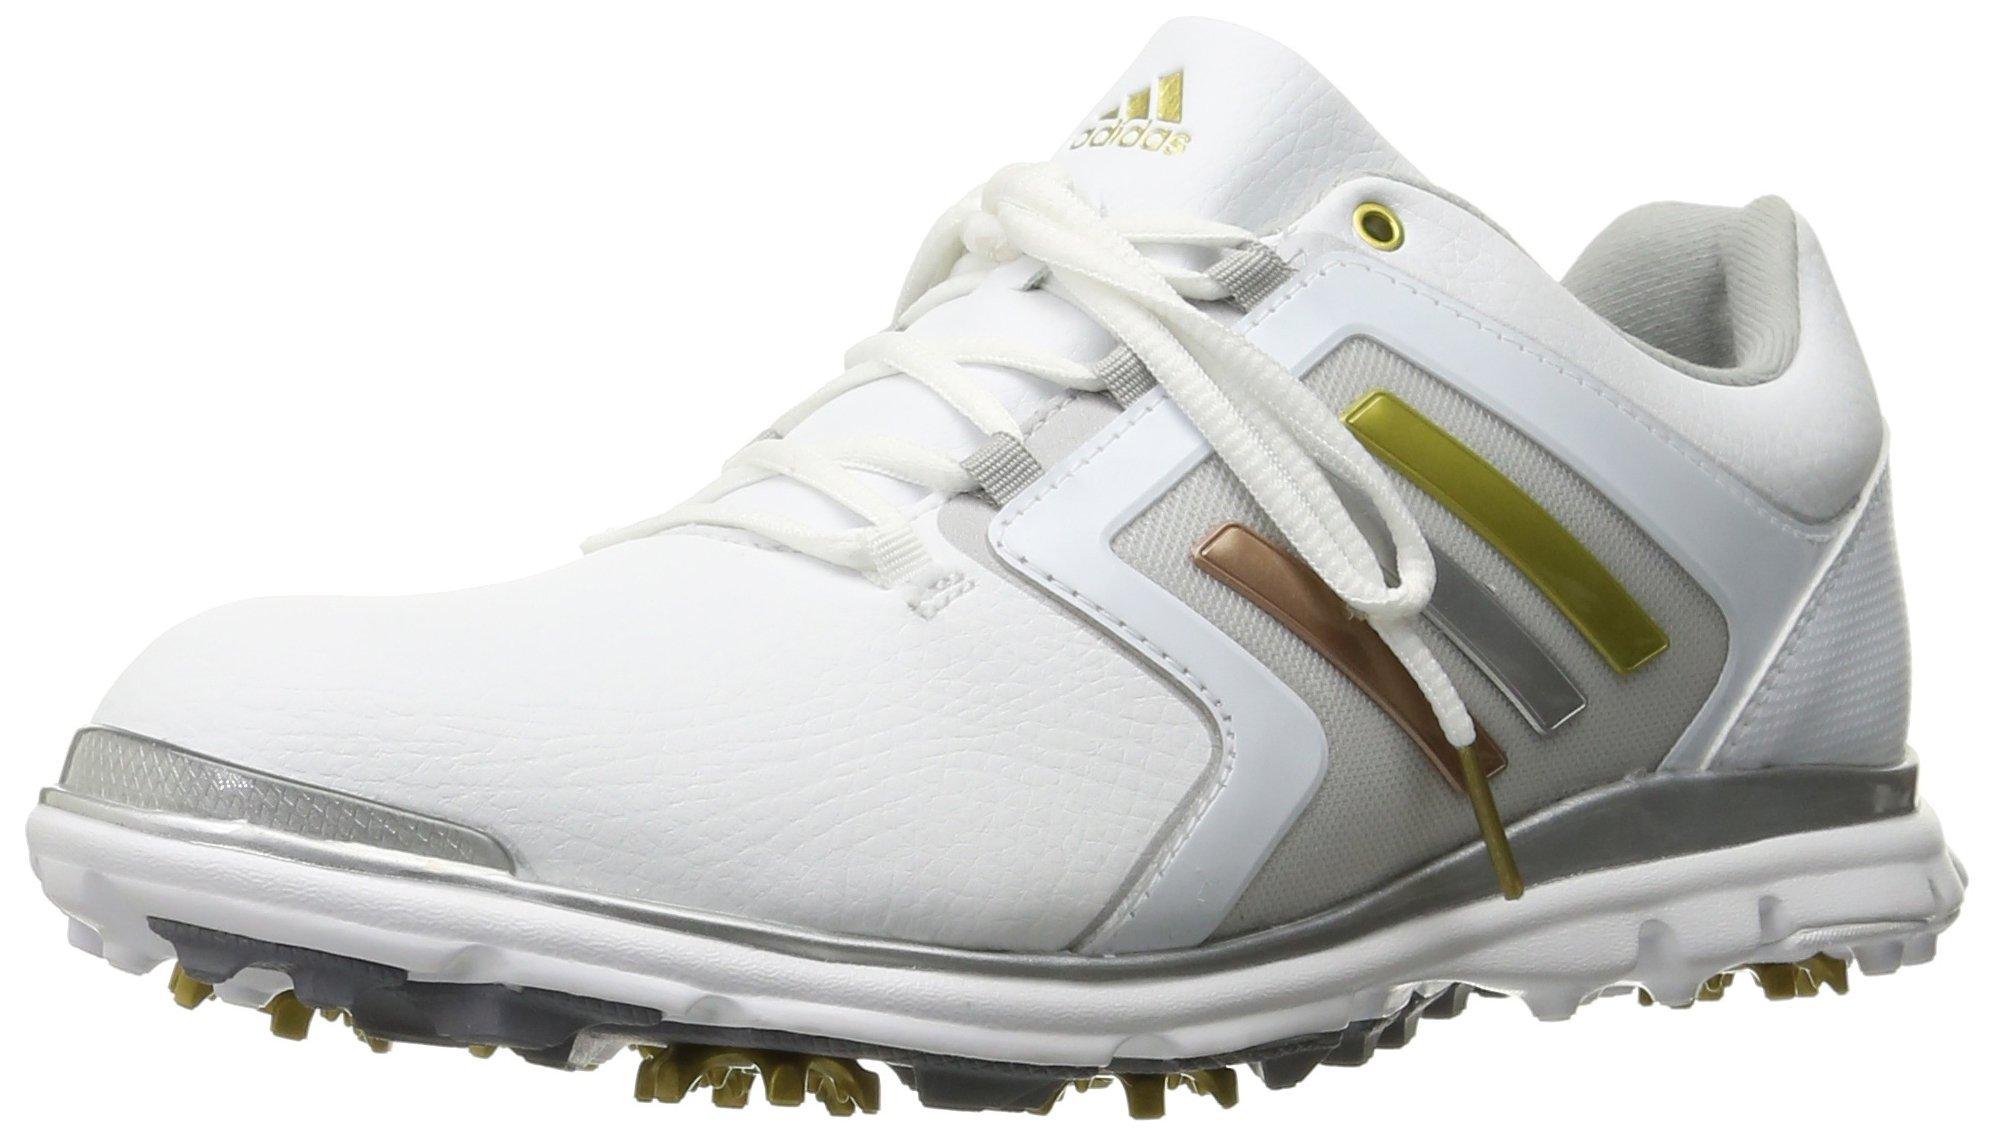 adidas Women's adistar Tour 6-spike Golf Shoe, Fatwa White/Silver Metallic/Gold Metallic - 9 B(M) US